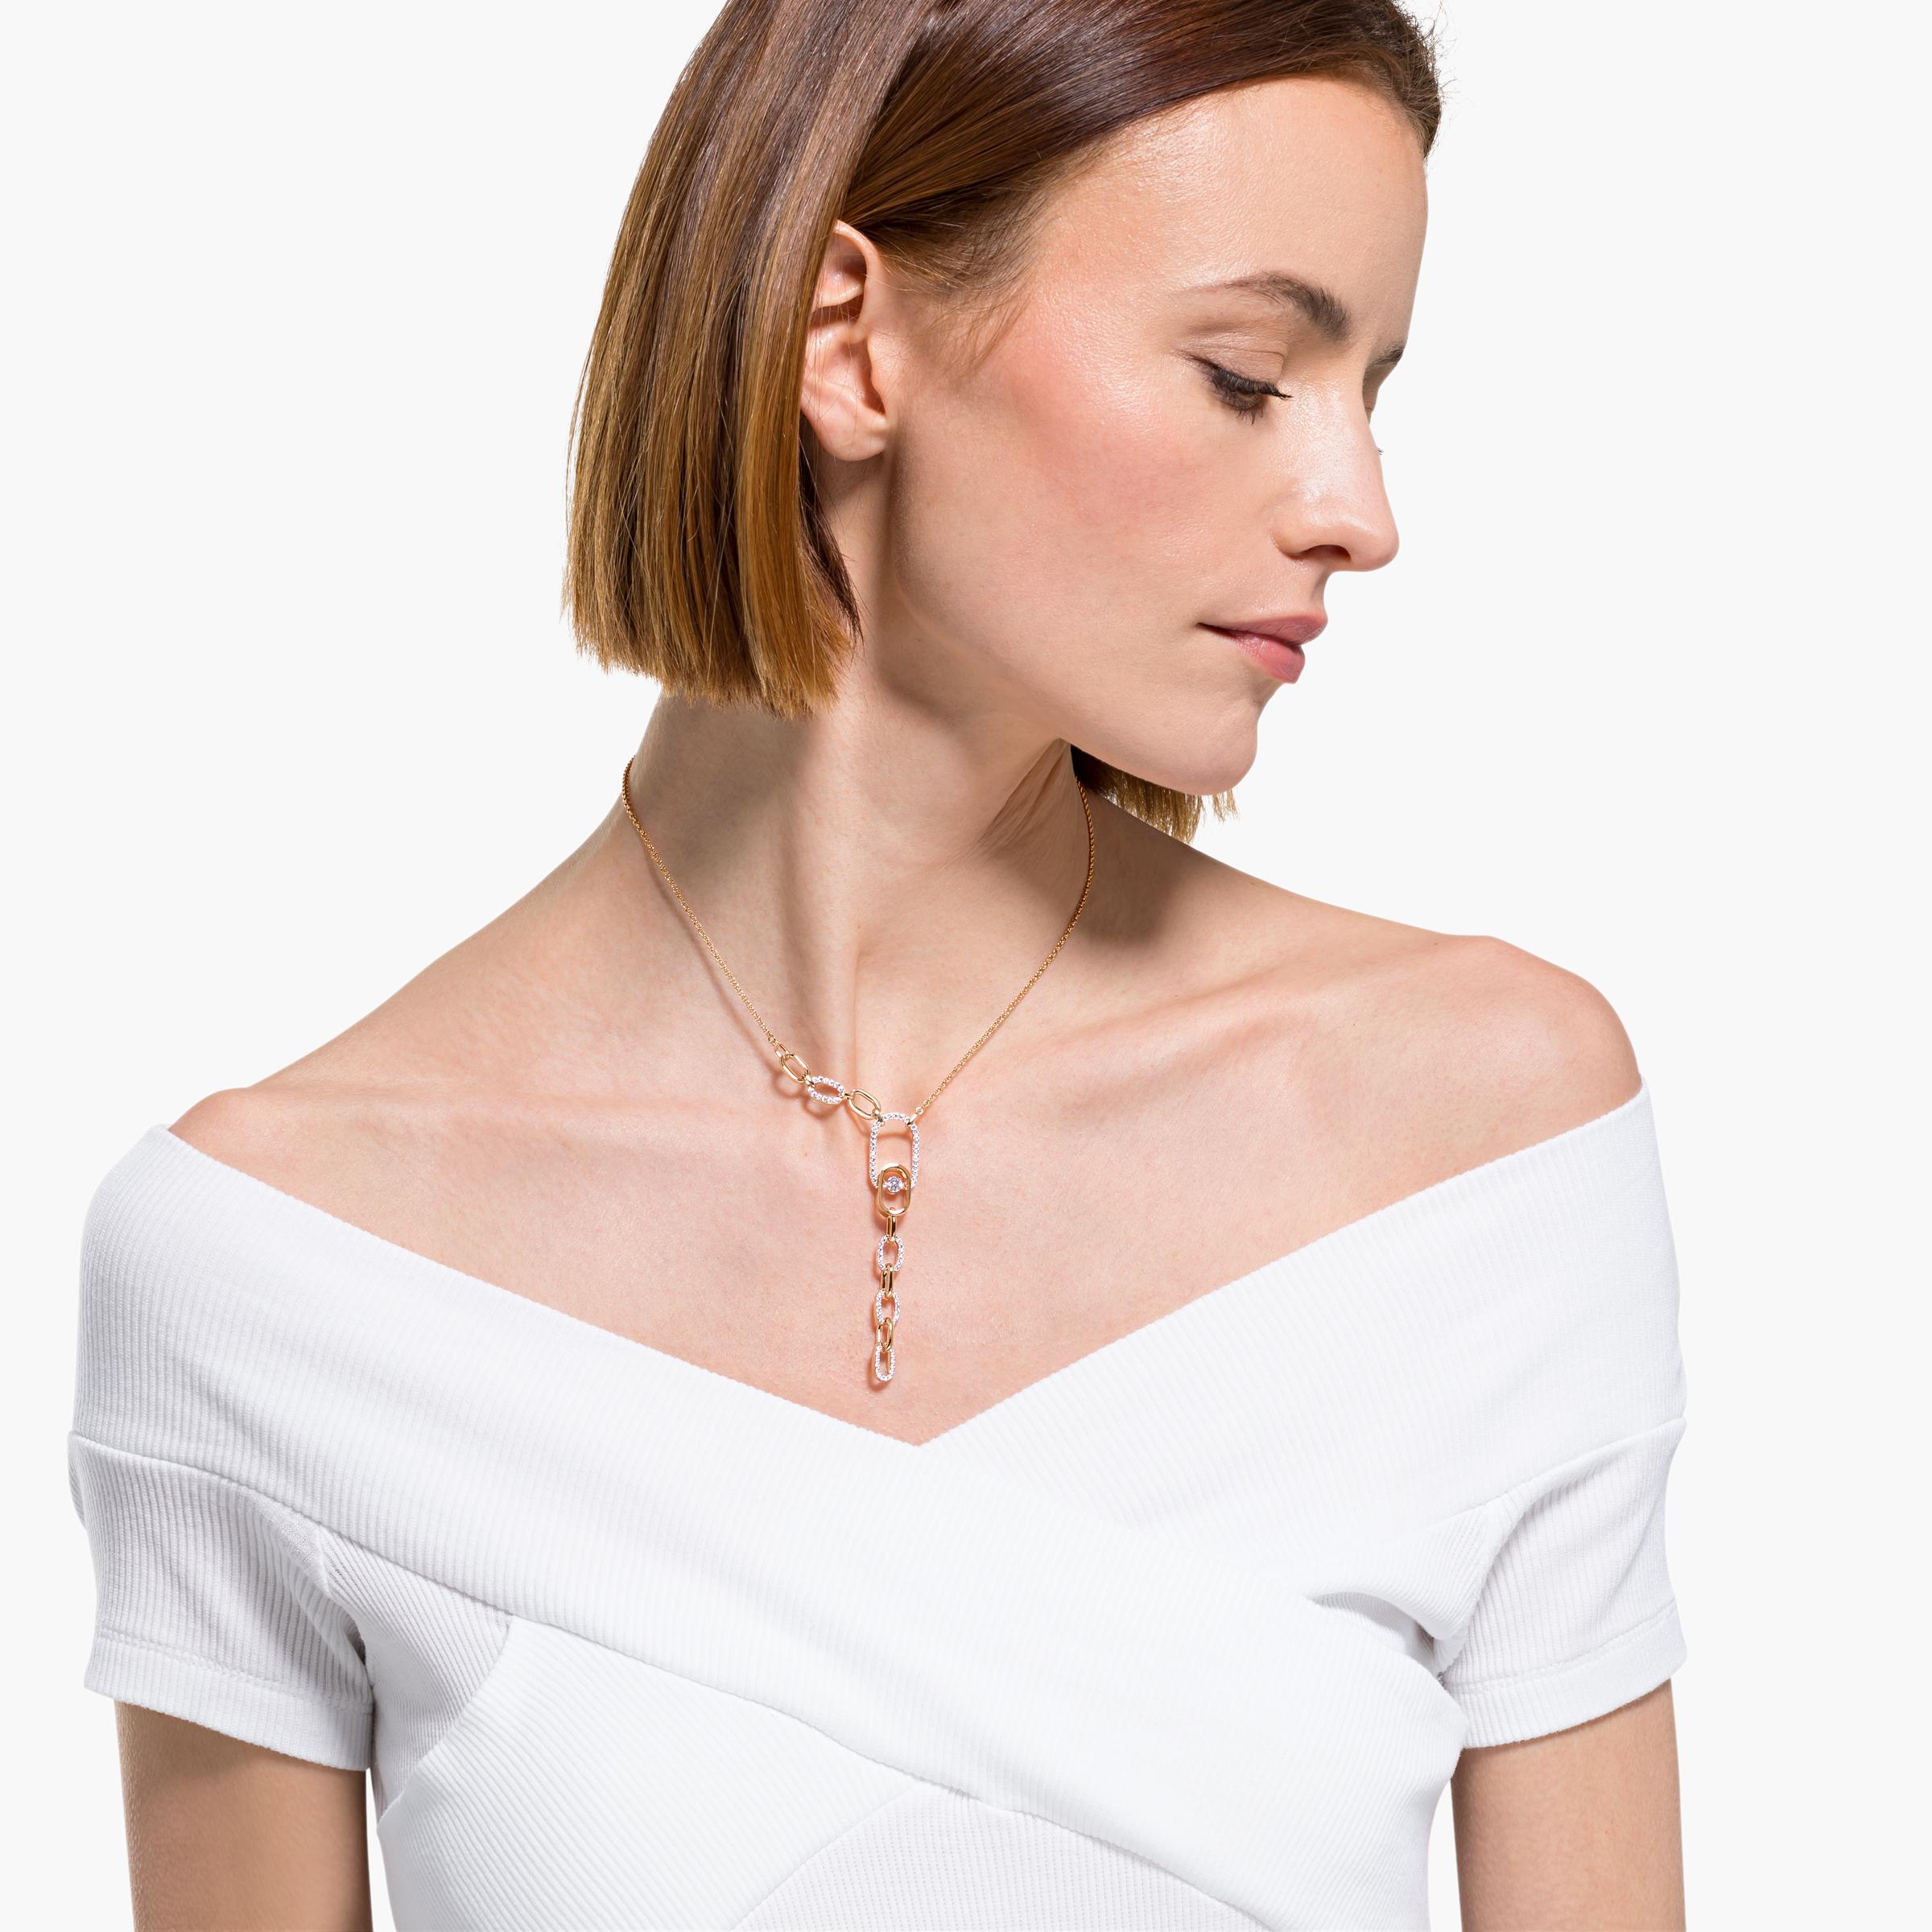 Collier en Y Swarovski Sparkling Dance North, blanc, finition mix de métal, Swarovski